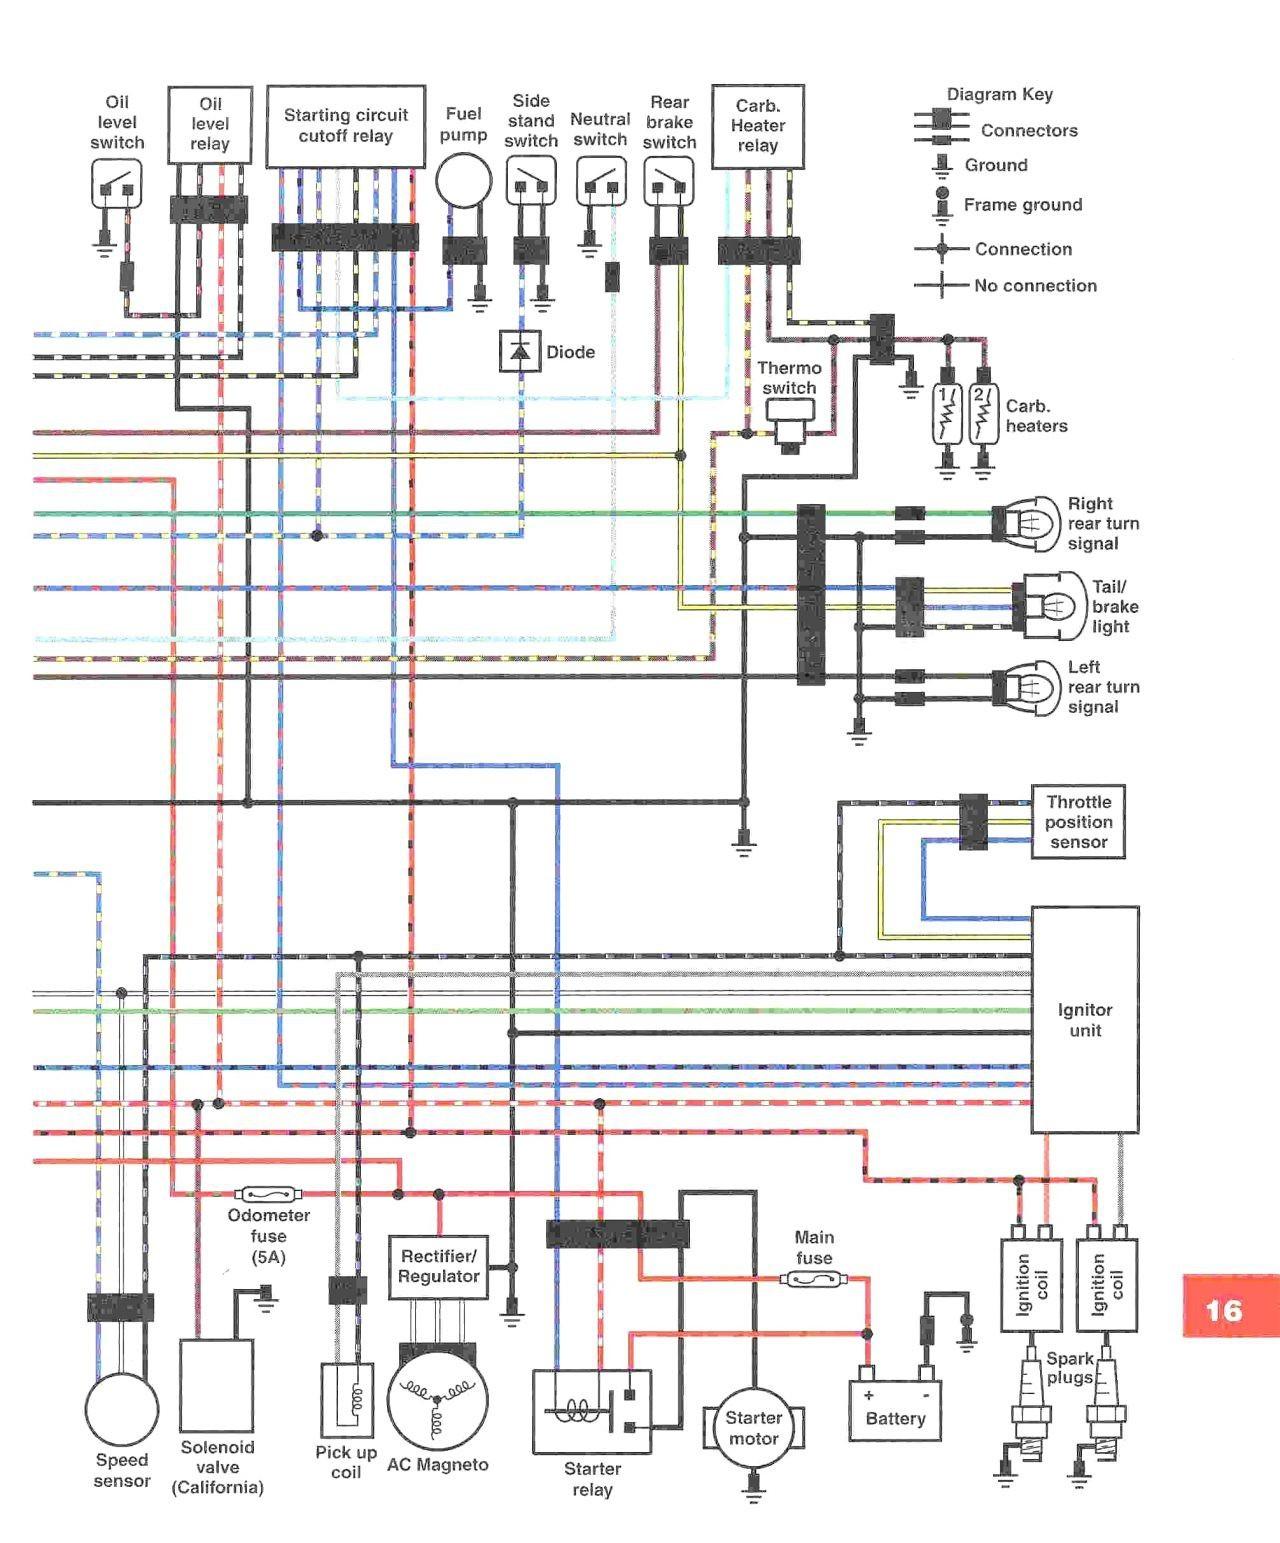 Meyer Plow Wiring Diagram Meyer E47 Wiring Diagram Best Fantastic Meyer Plow Control Wiring Of Meyer Plow Wiring Diagram